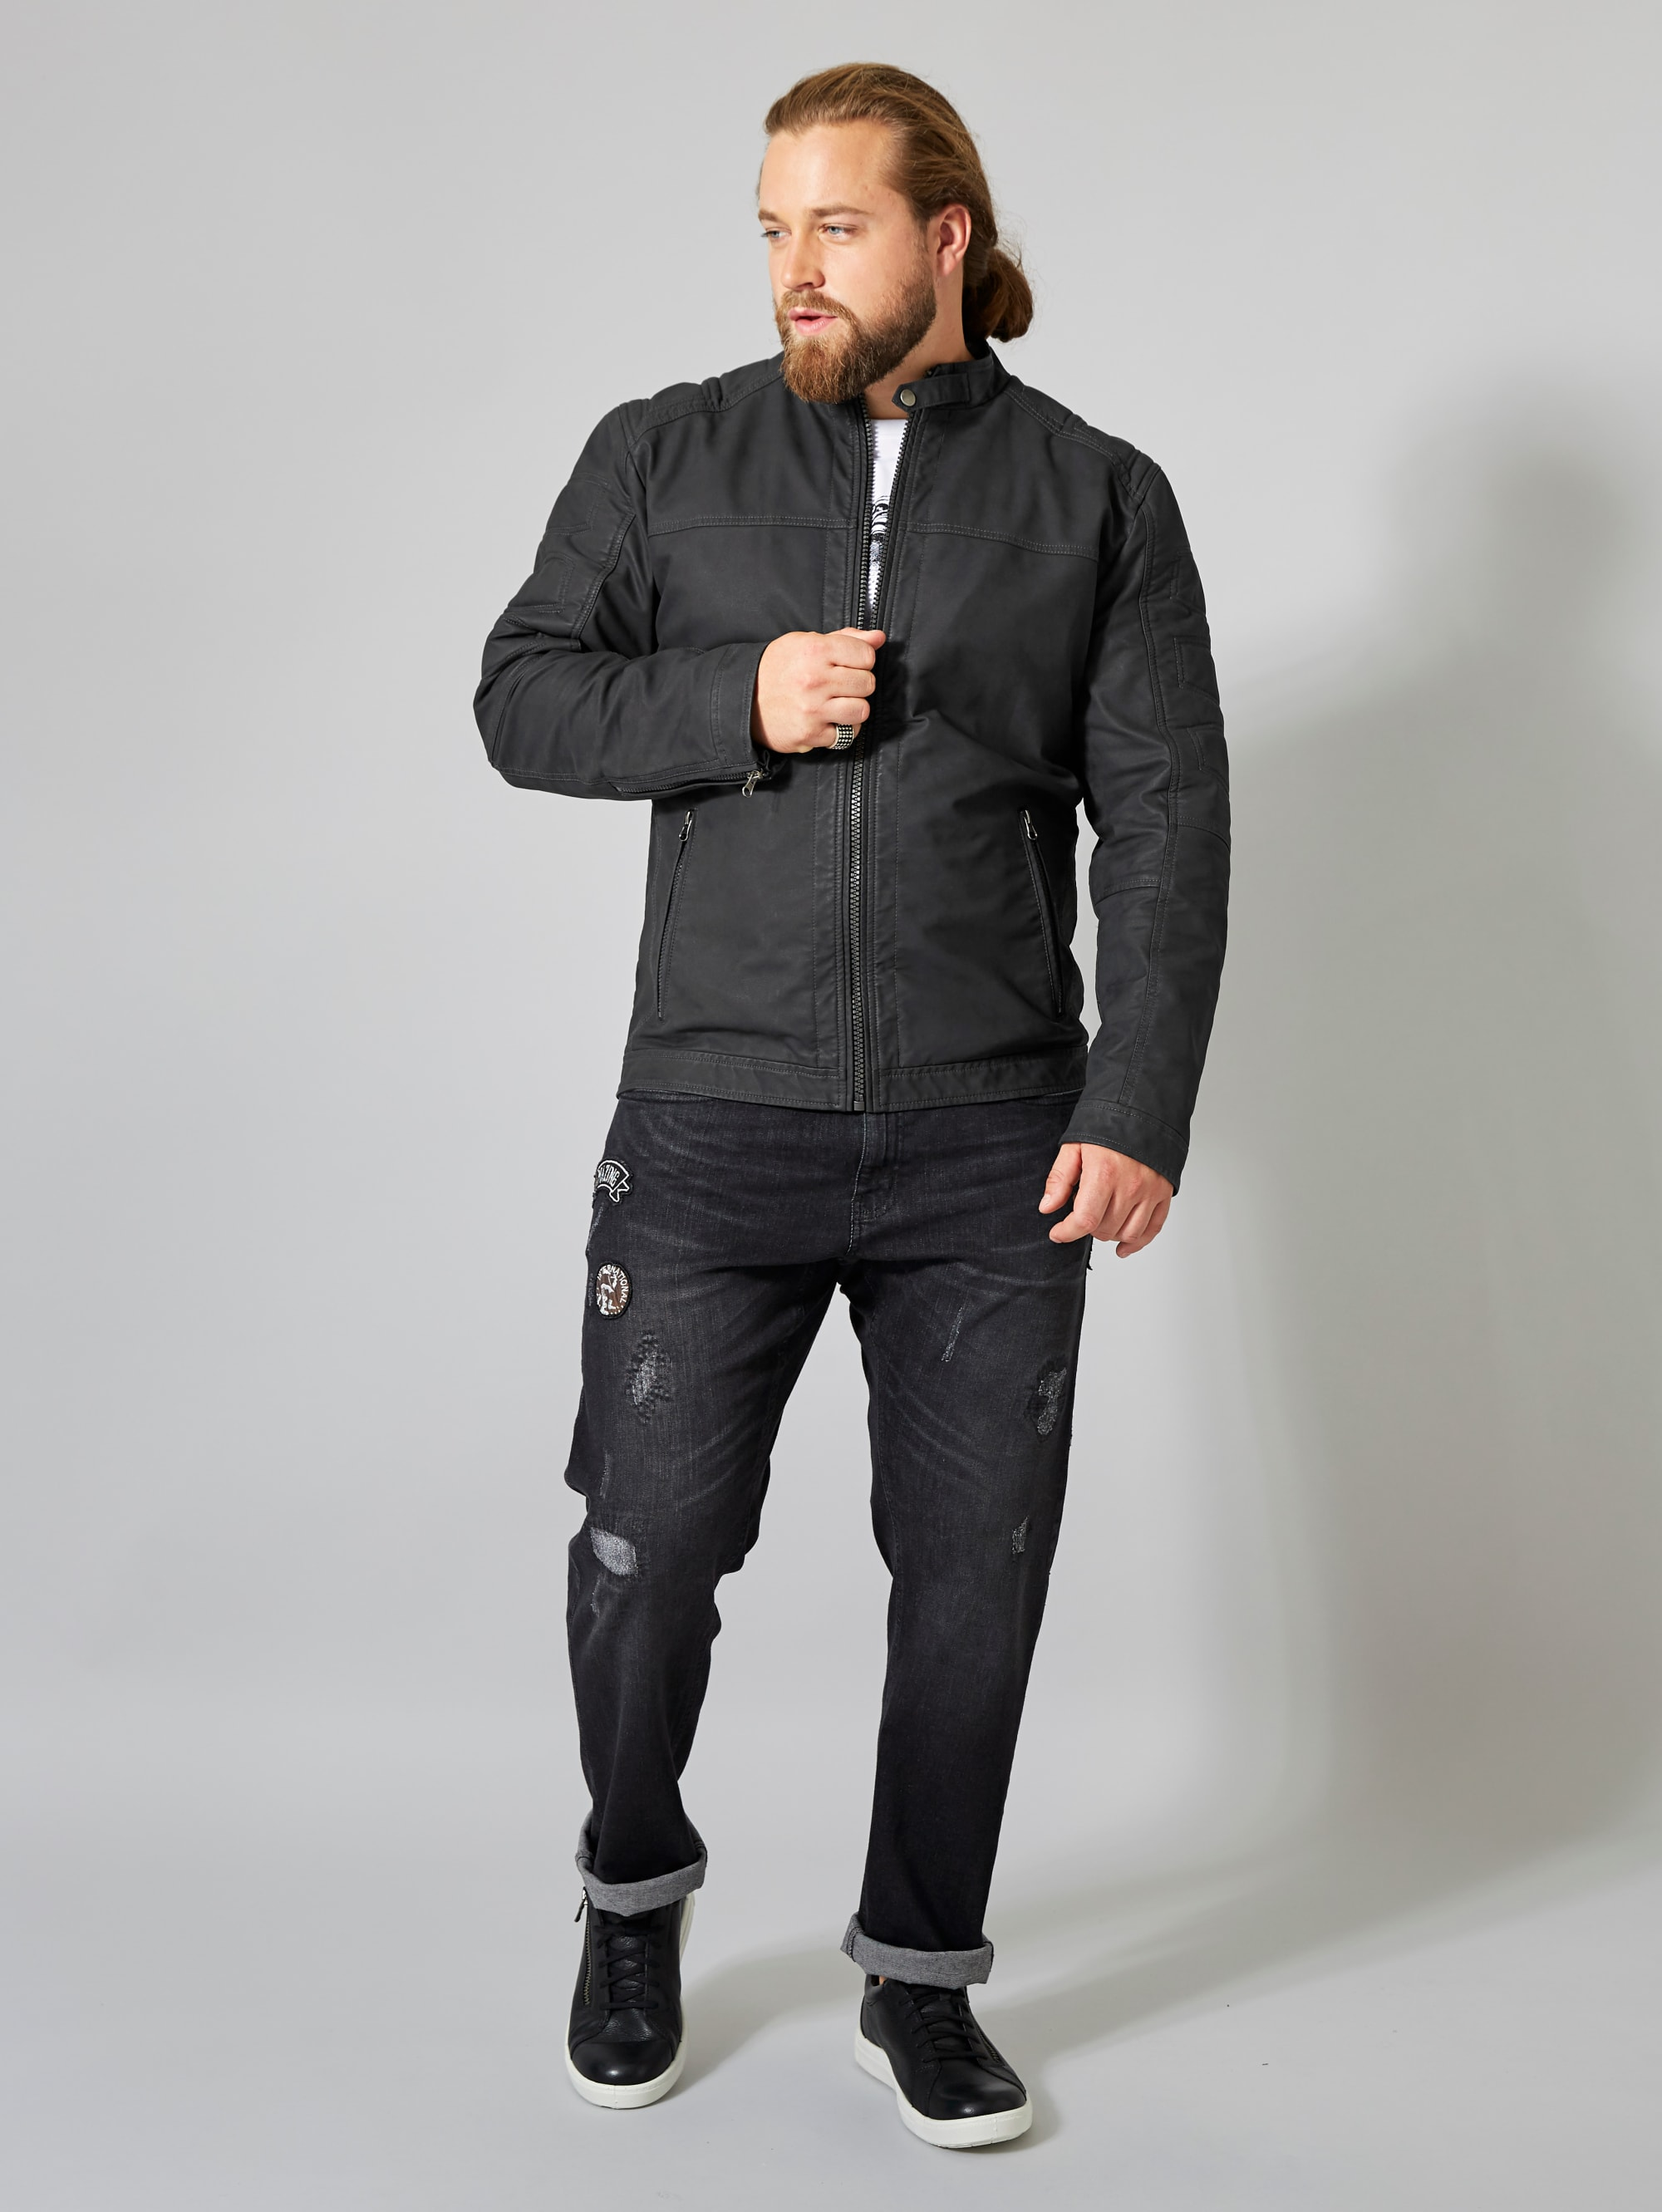 Men Plus by Happy Size Lederimitatjacke   Bekleidung > Jacken > Kunstlederjacken   Men Plus By Happy Size